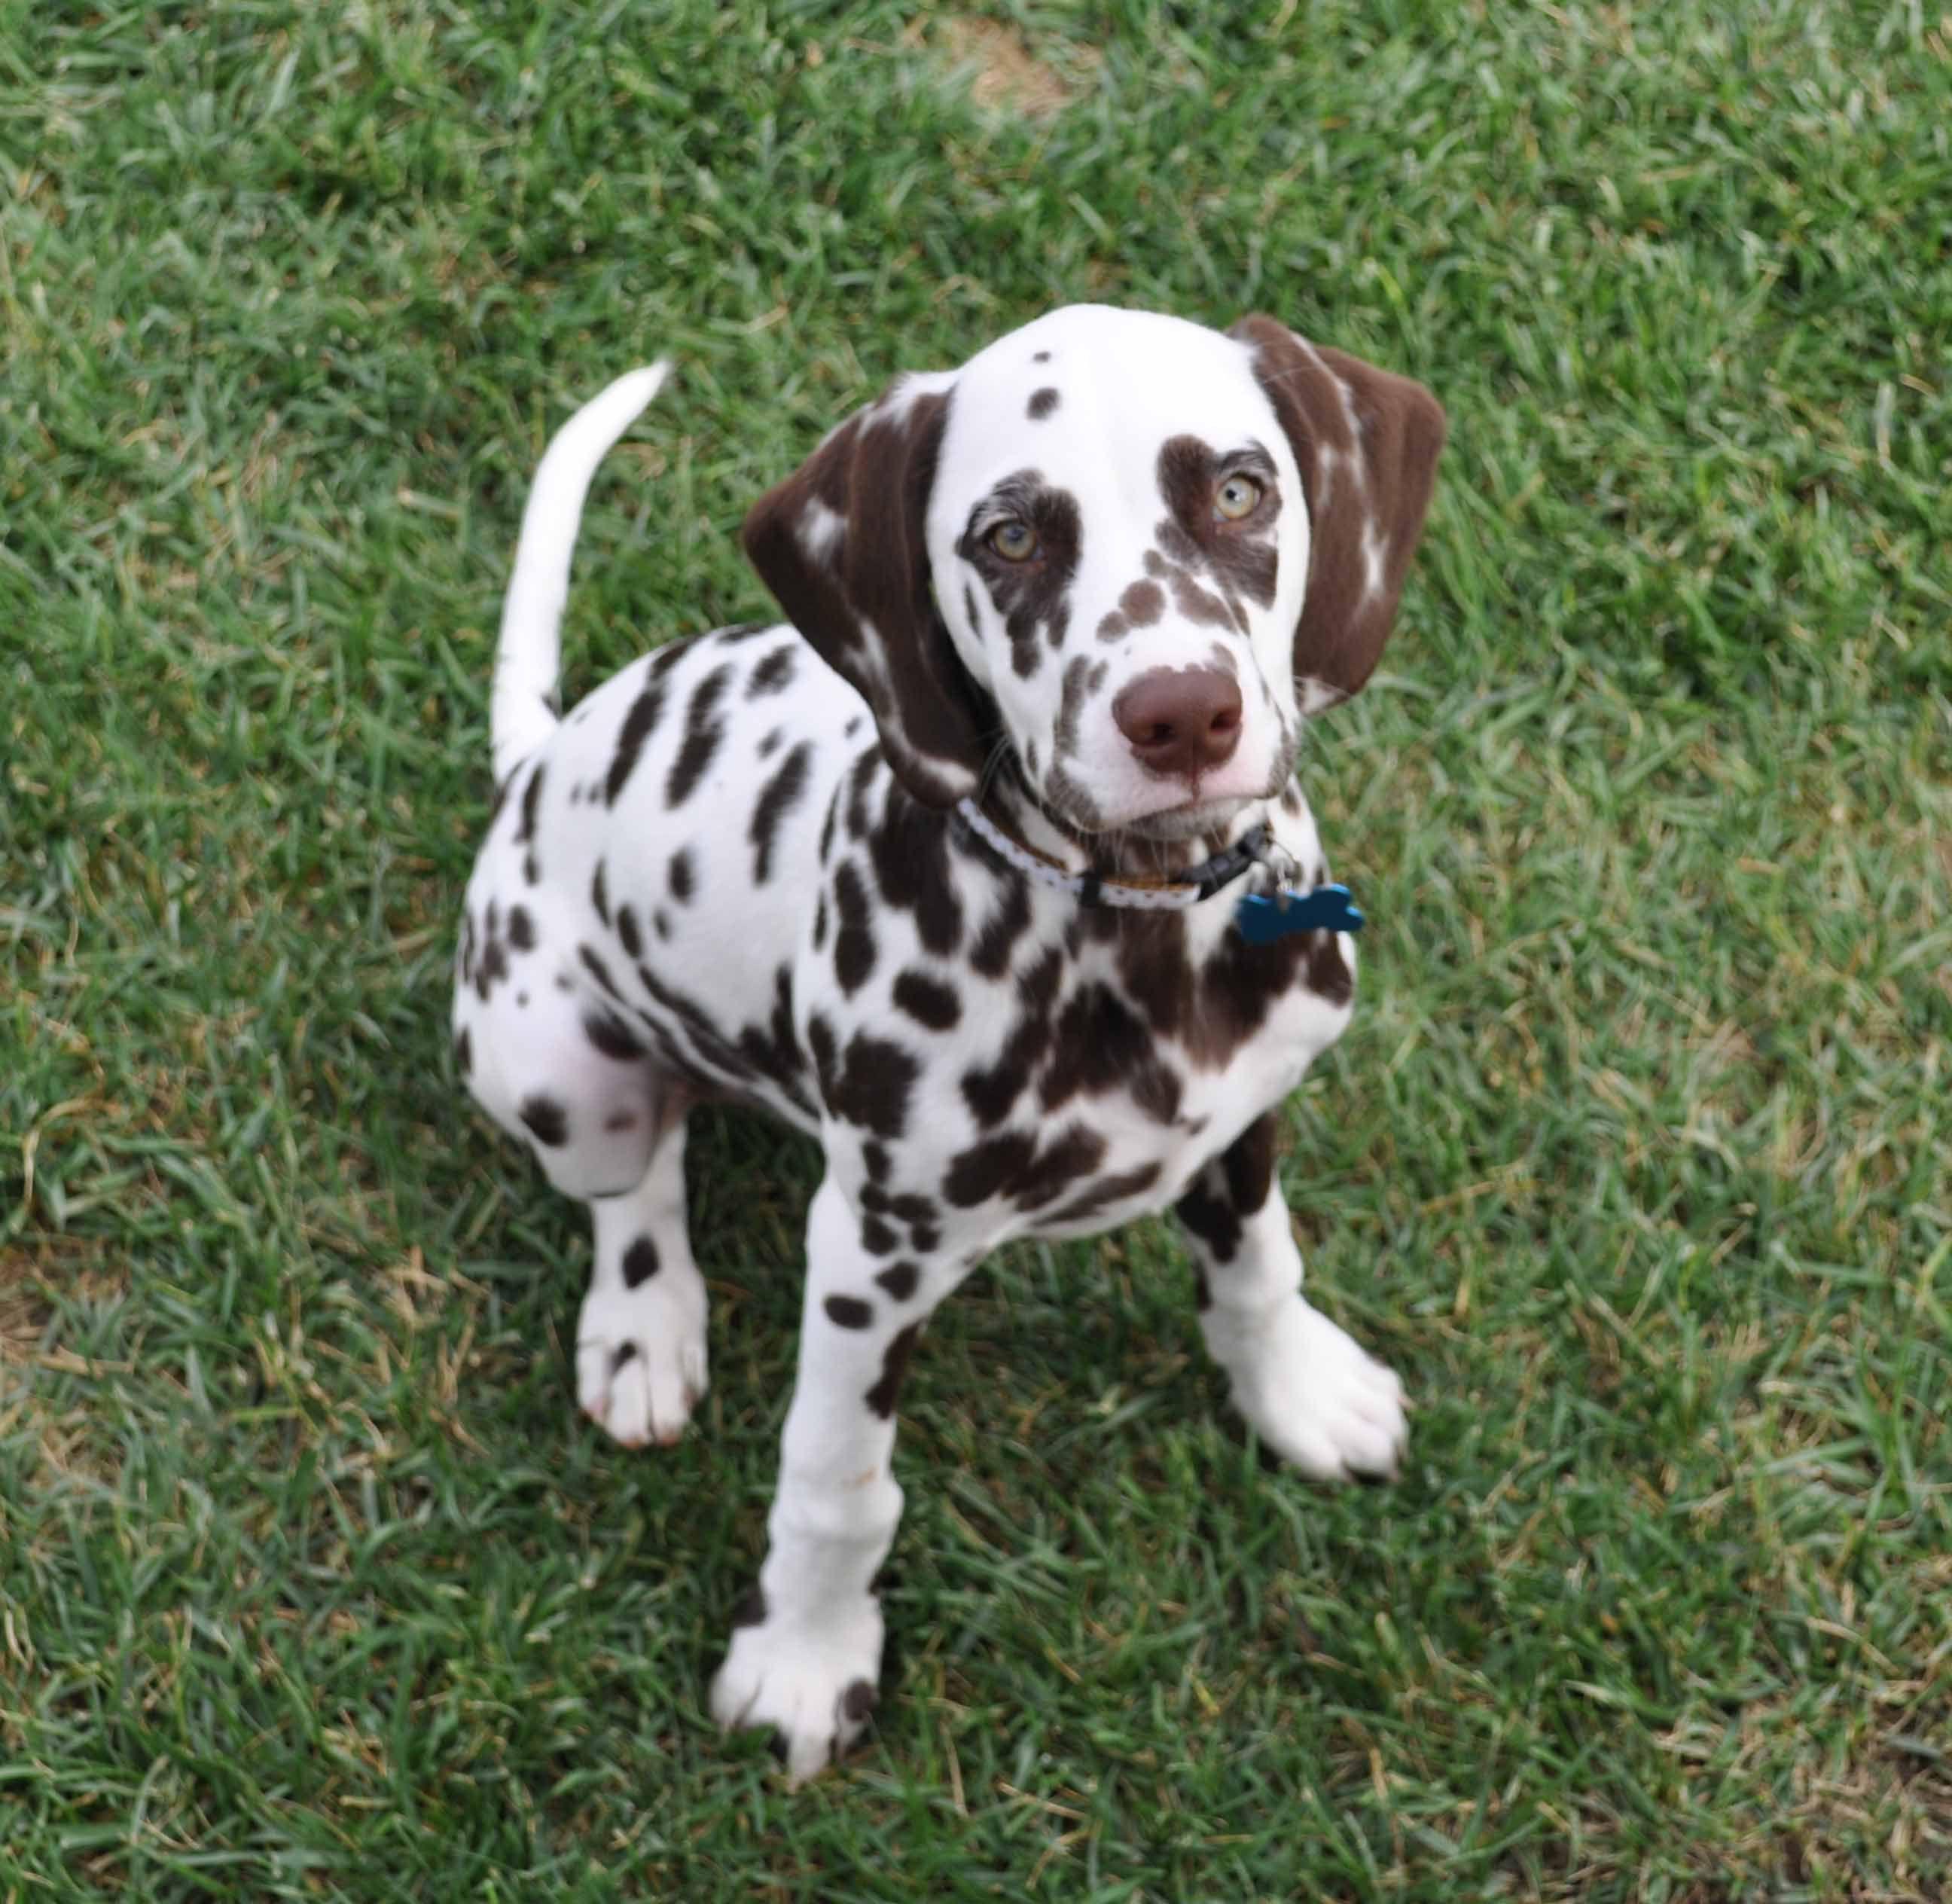 F Freckles Dalmatian Dogs Dalmatian Puppy Your Dog